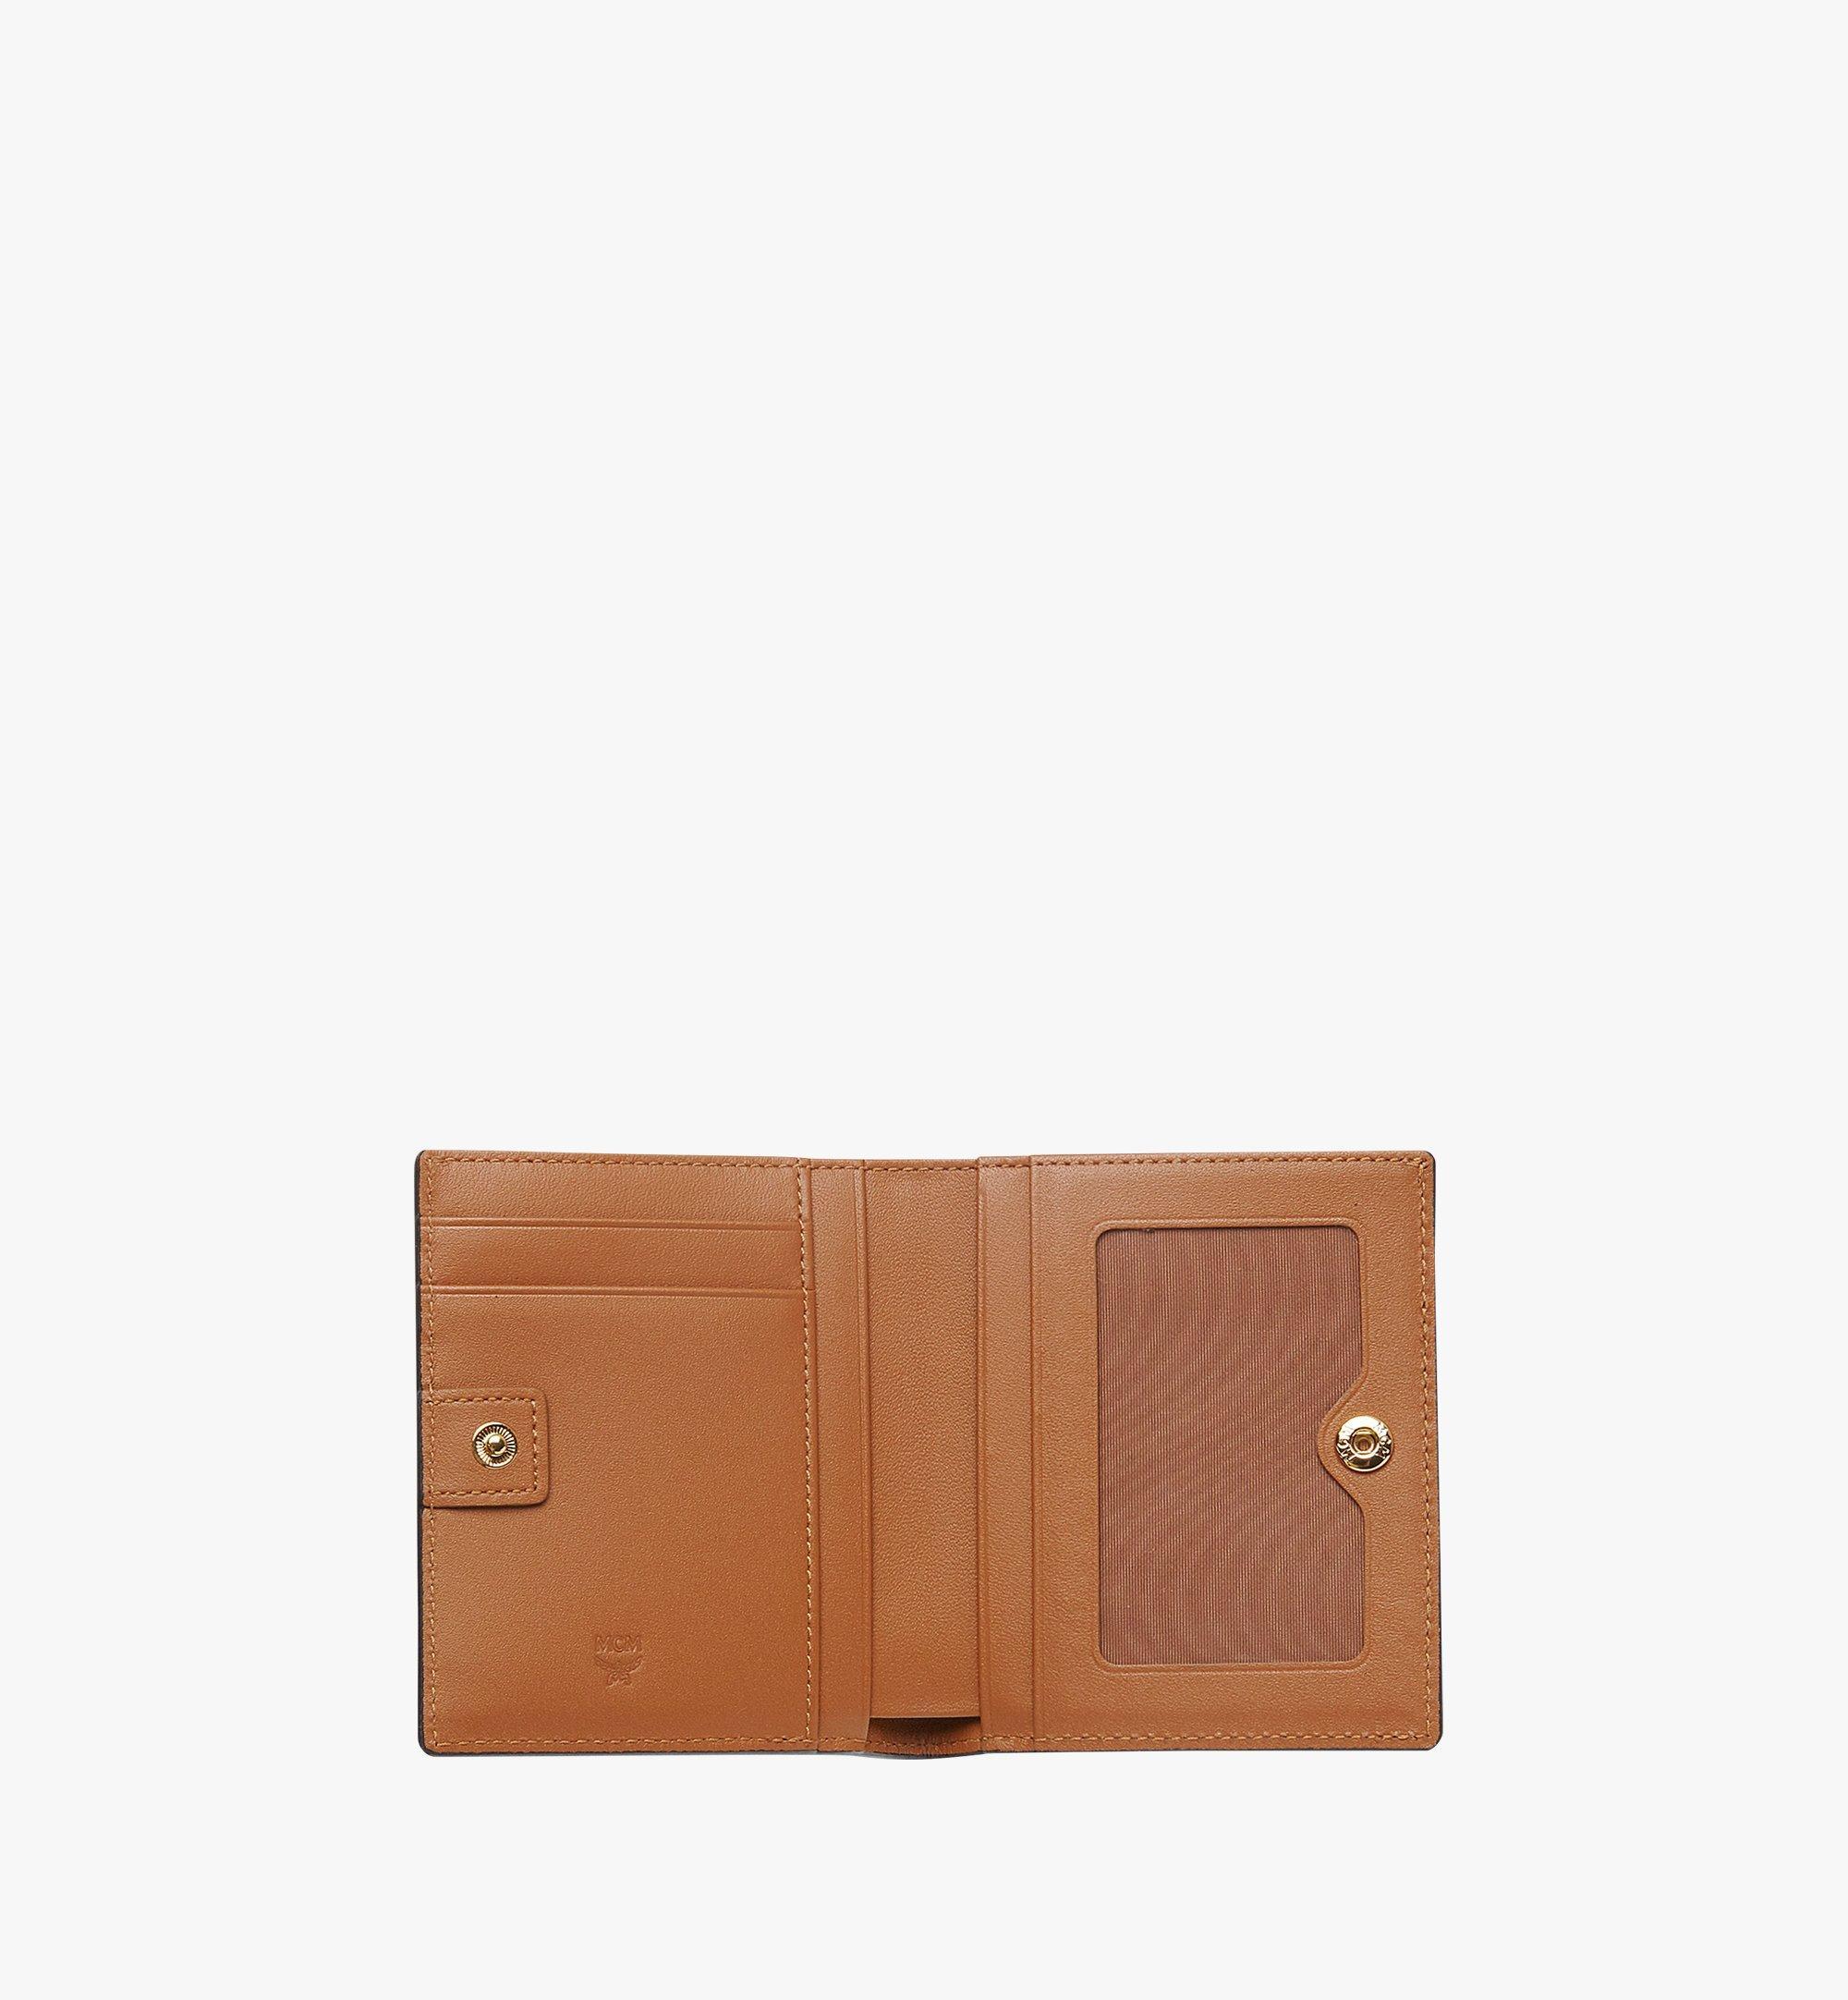 MCM Two Fold Wallet in Visetos Original Cognac MYS8SVI94CO001 Alternate View 5